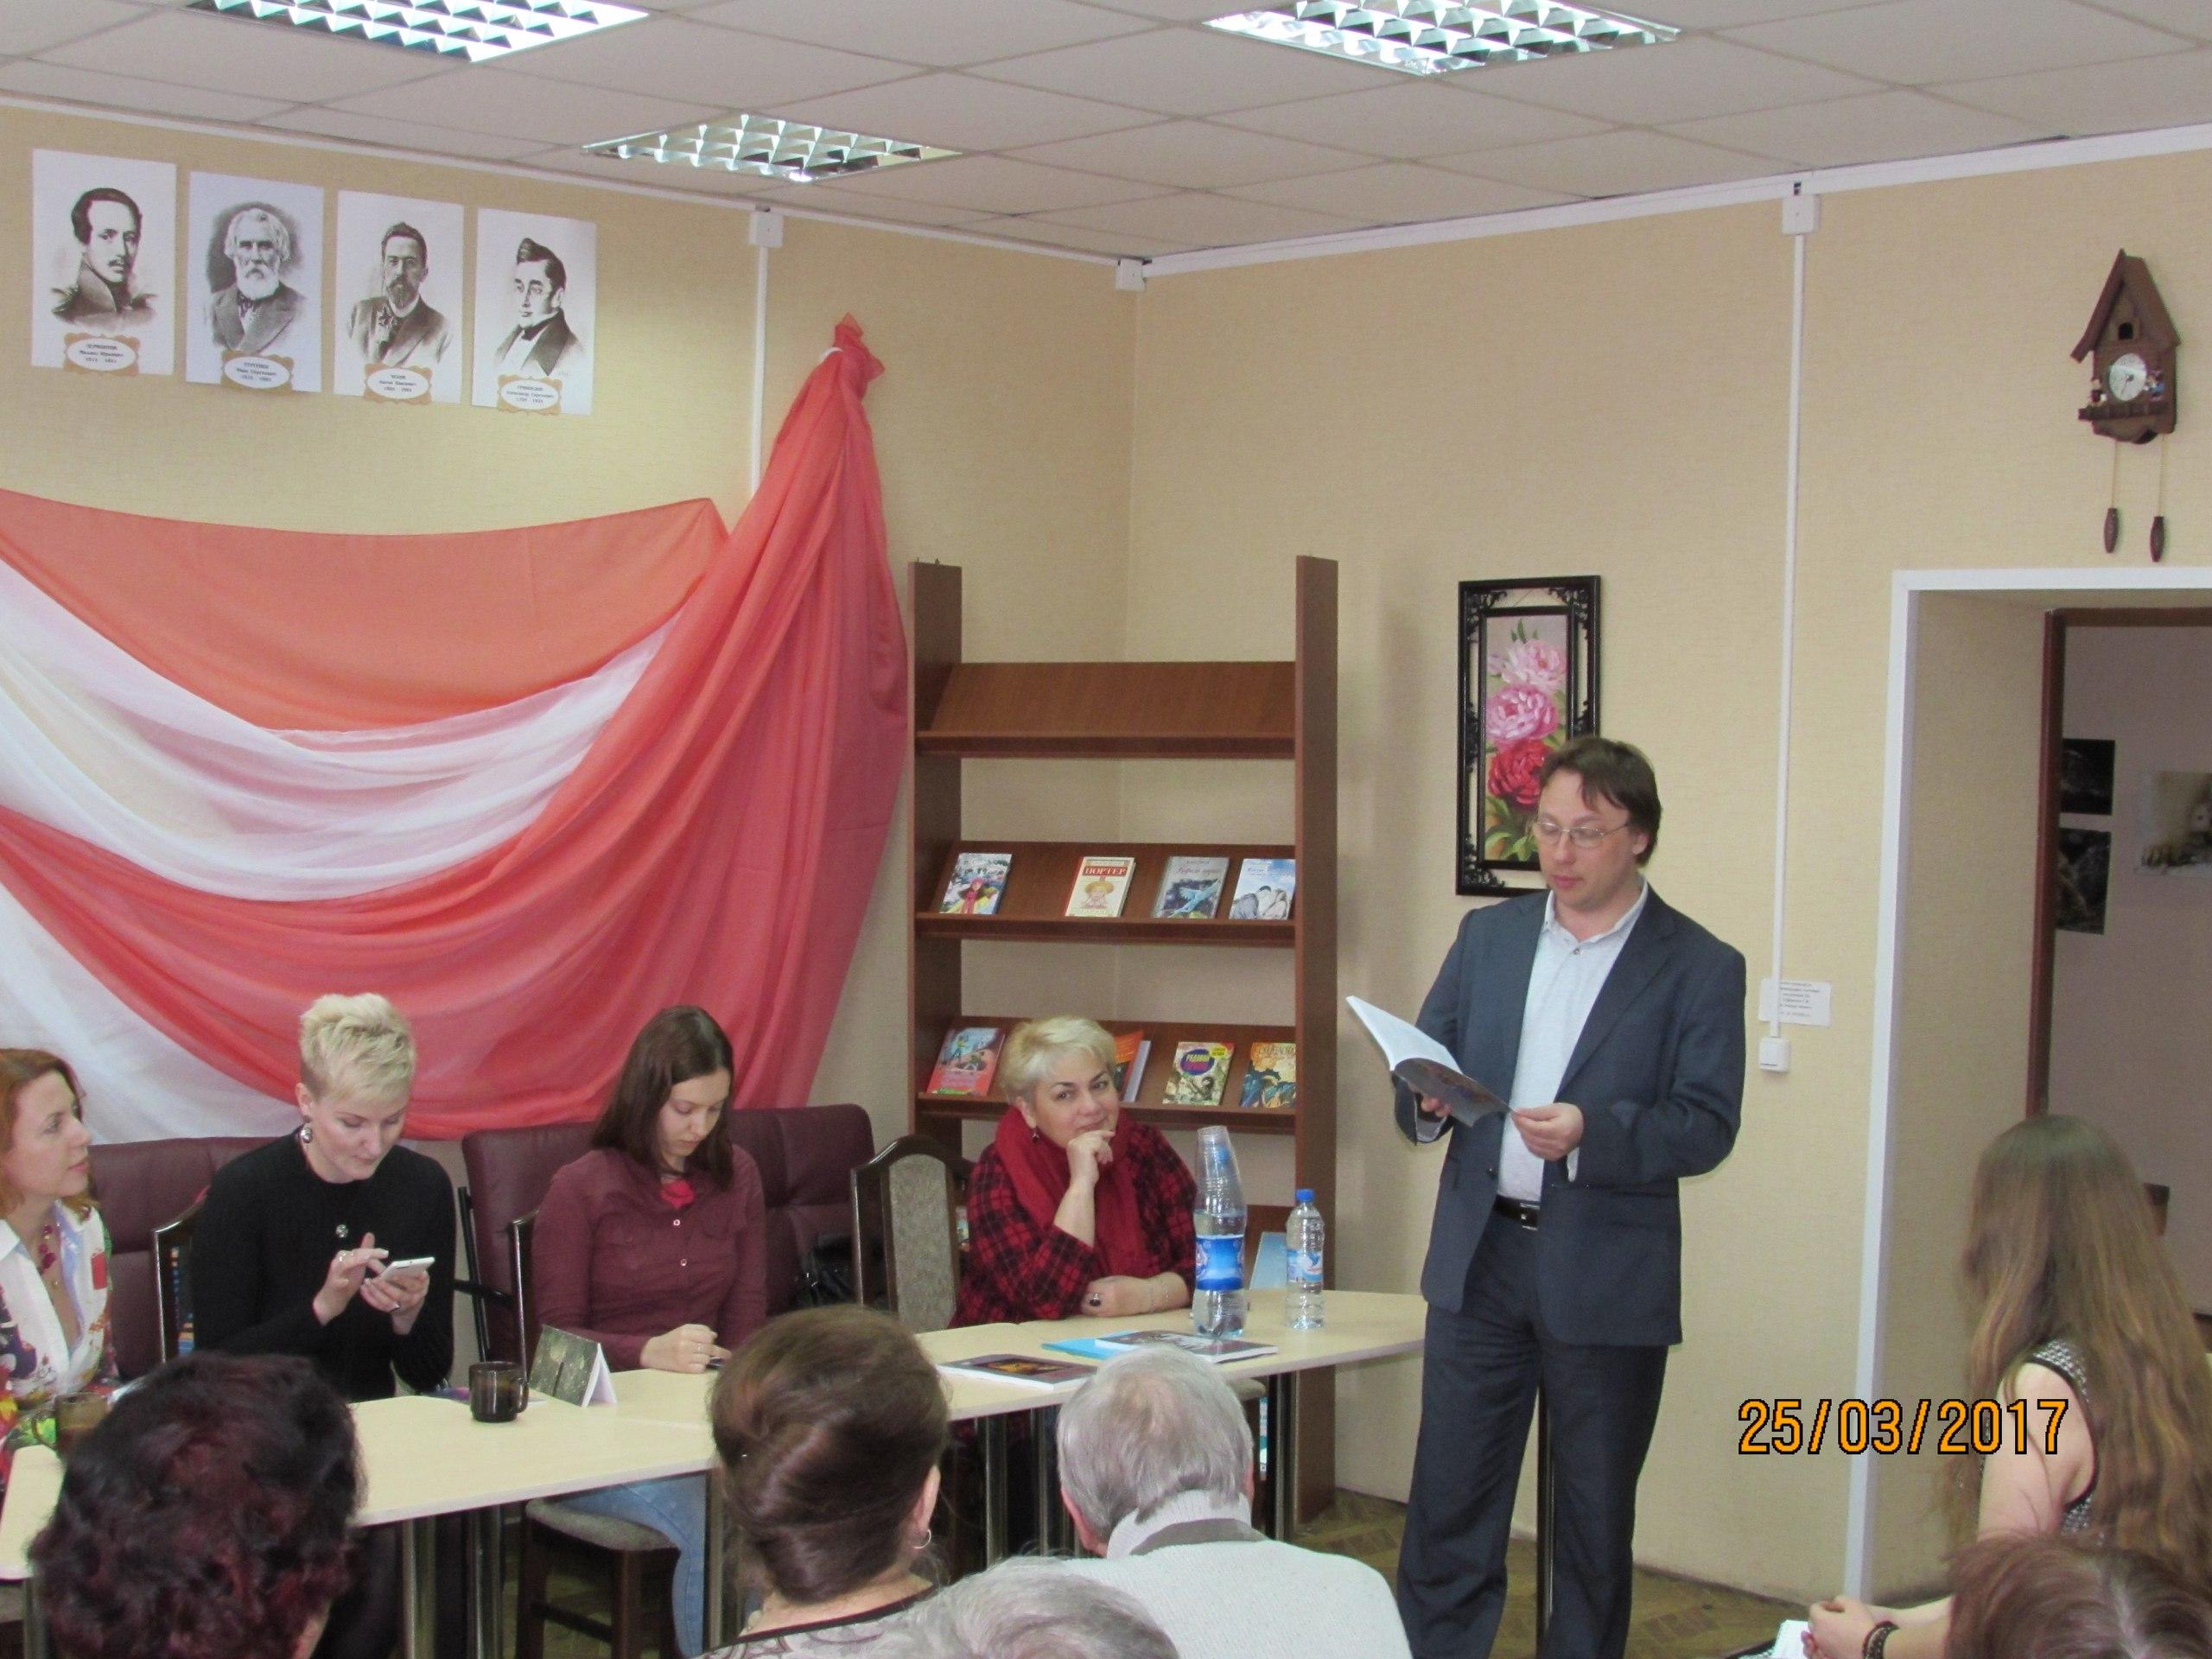 Слева направо Мария Дубиковская, Ирина Куртмазова, Василина Владимирцева, Ольга Дубровина, Павел Куравский